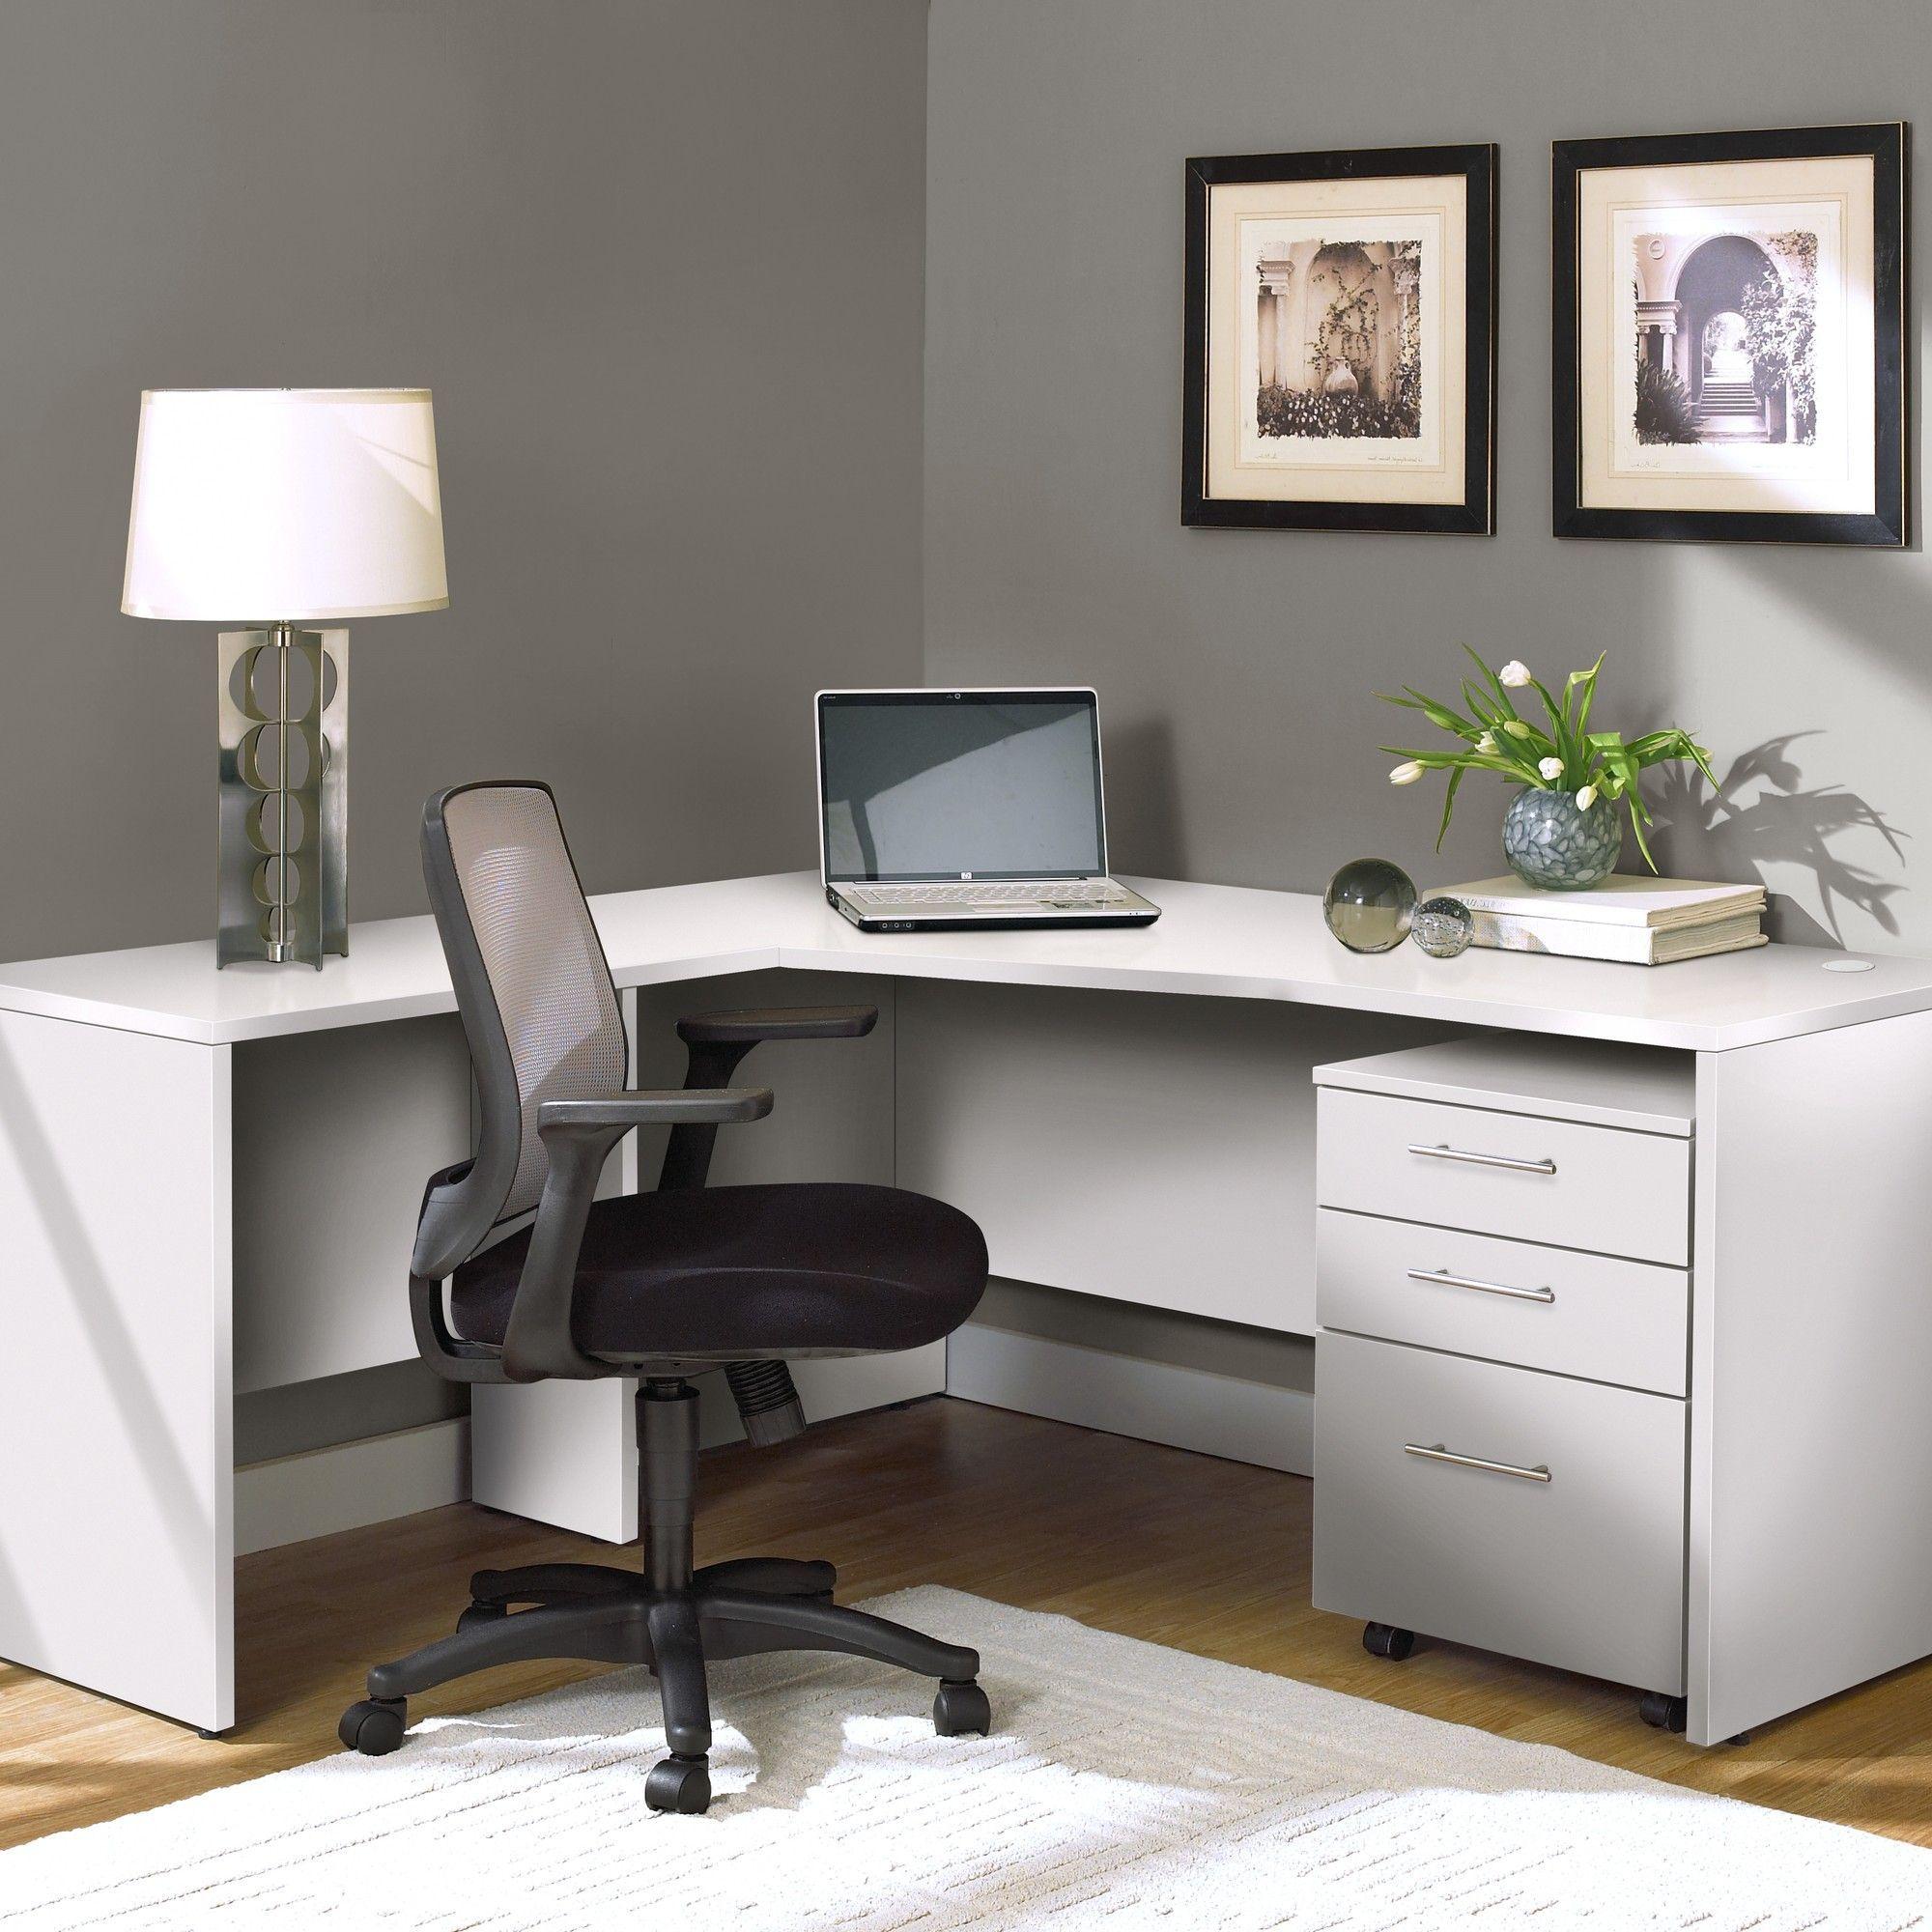 L Shape Corner Desk L Shaped Corner Desk L Shaped Desk White L Shaped Desk